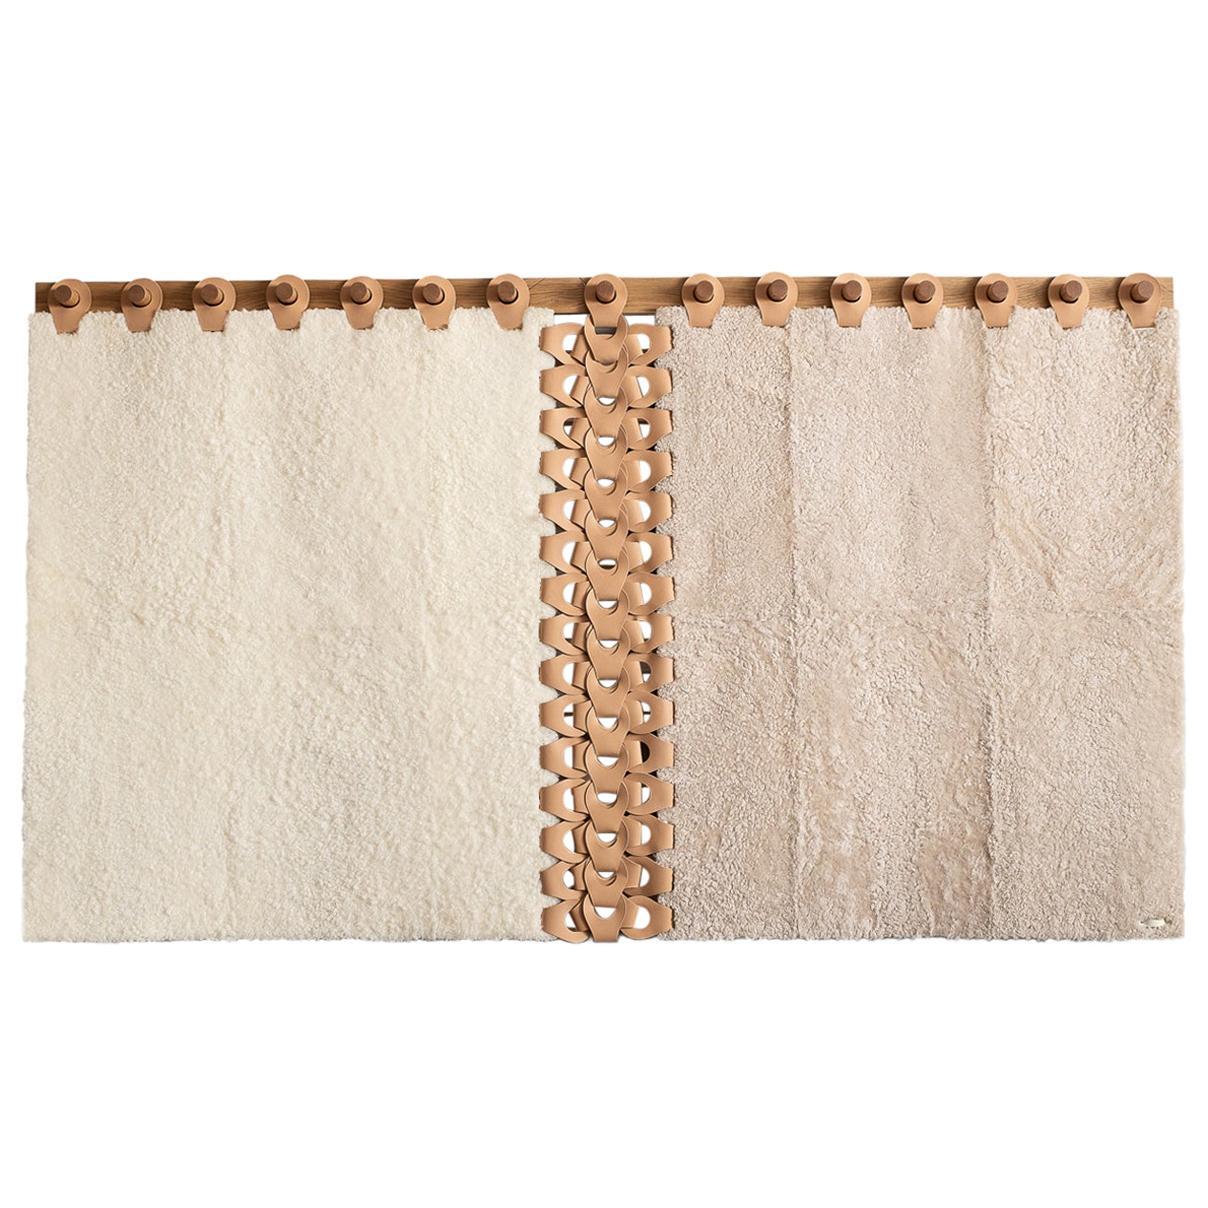 "Vertebrae X Headboard Tapestry 72"" in Soft Neutrals by Moses Nadel"